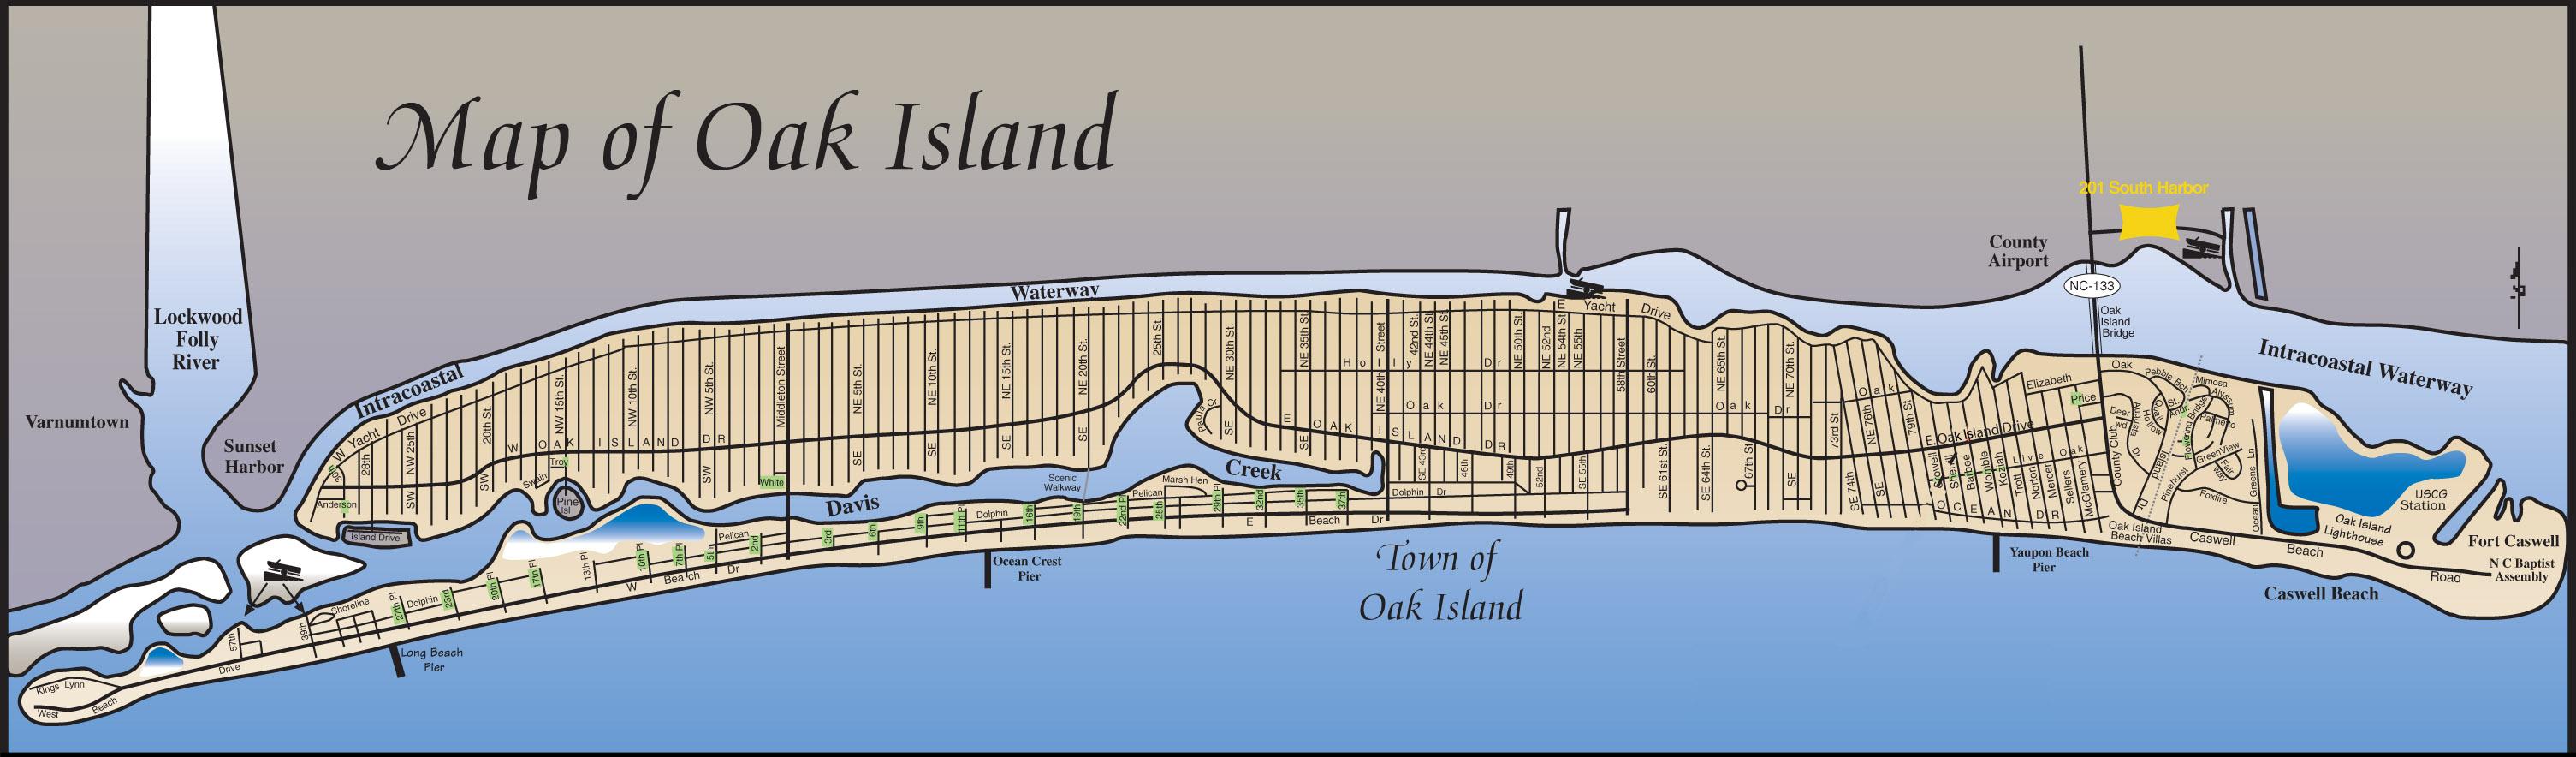 Oak Island Nc Myrtle Beach Airport Shuttle Official Site